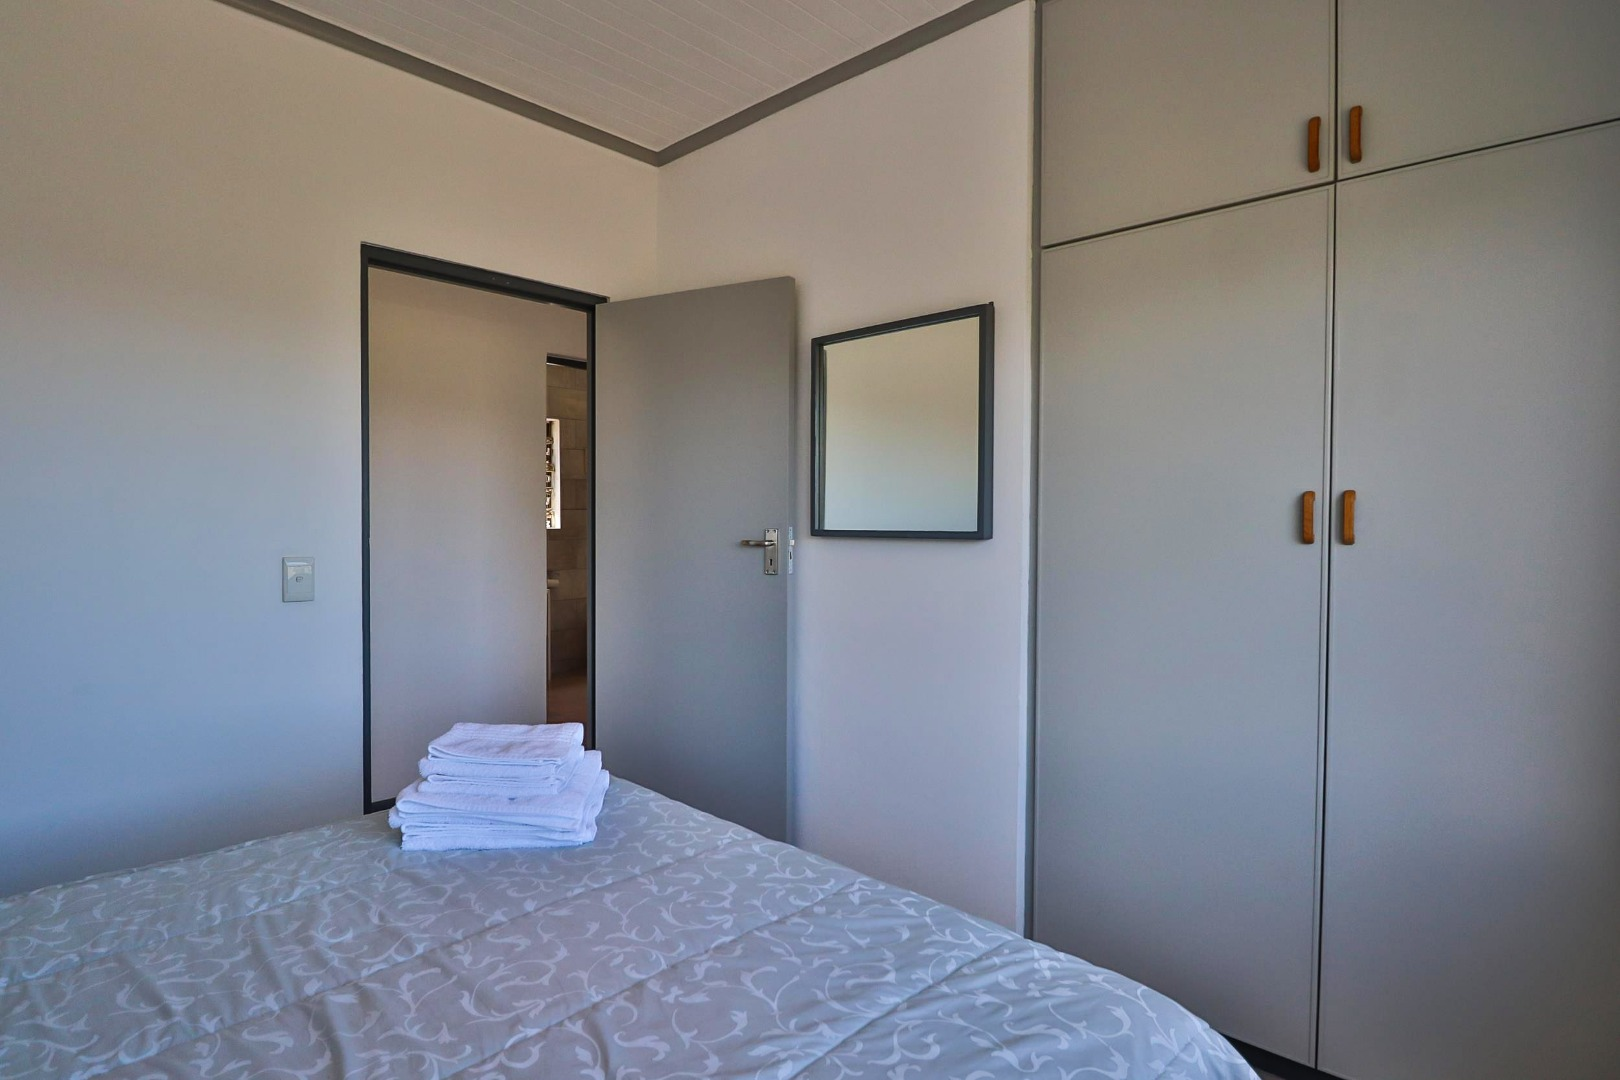 4 Bedroom House For Sale in Myoli Beach